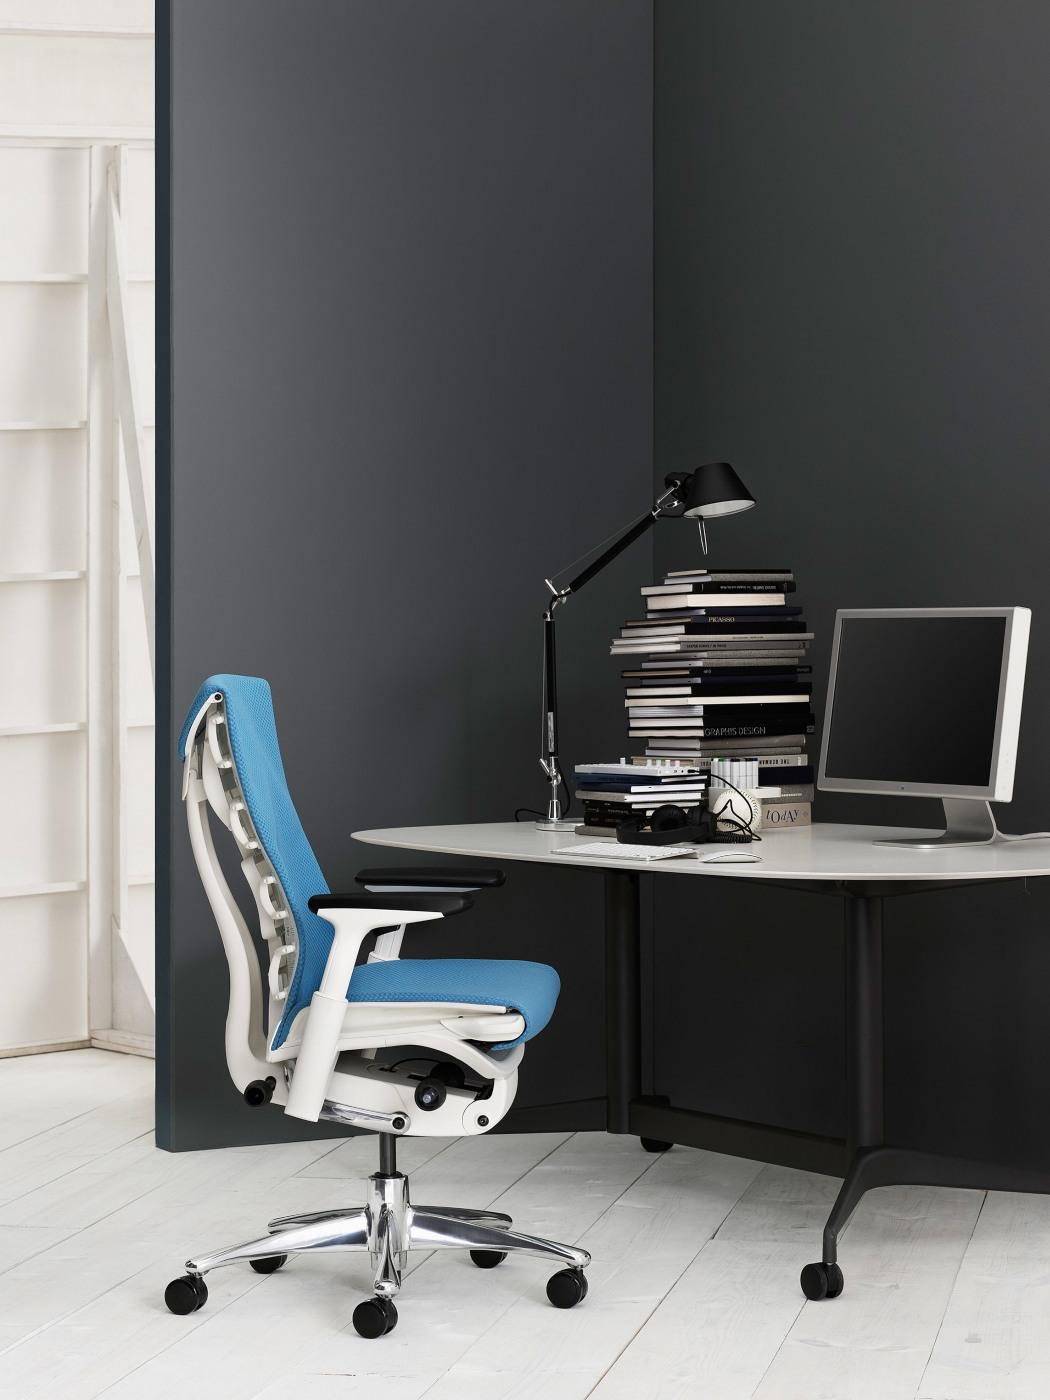 sillas ergonomicas adeyaka bcn